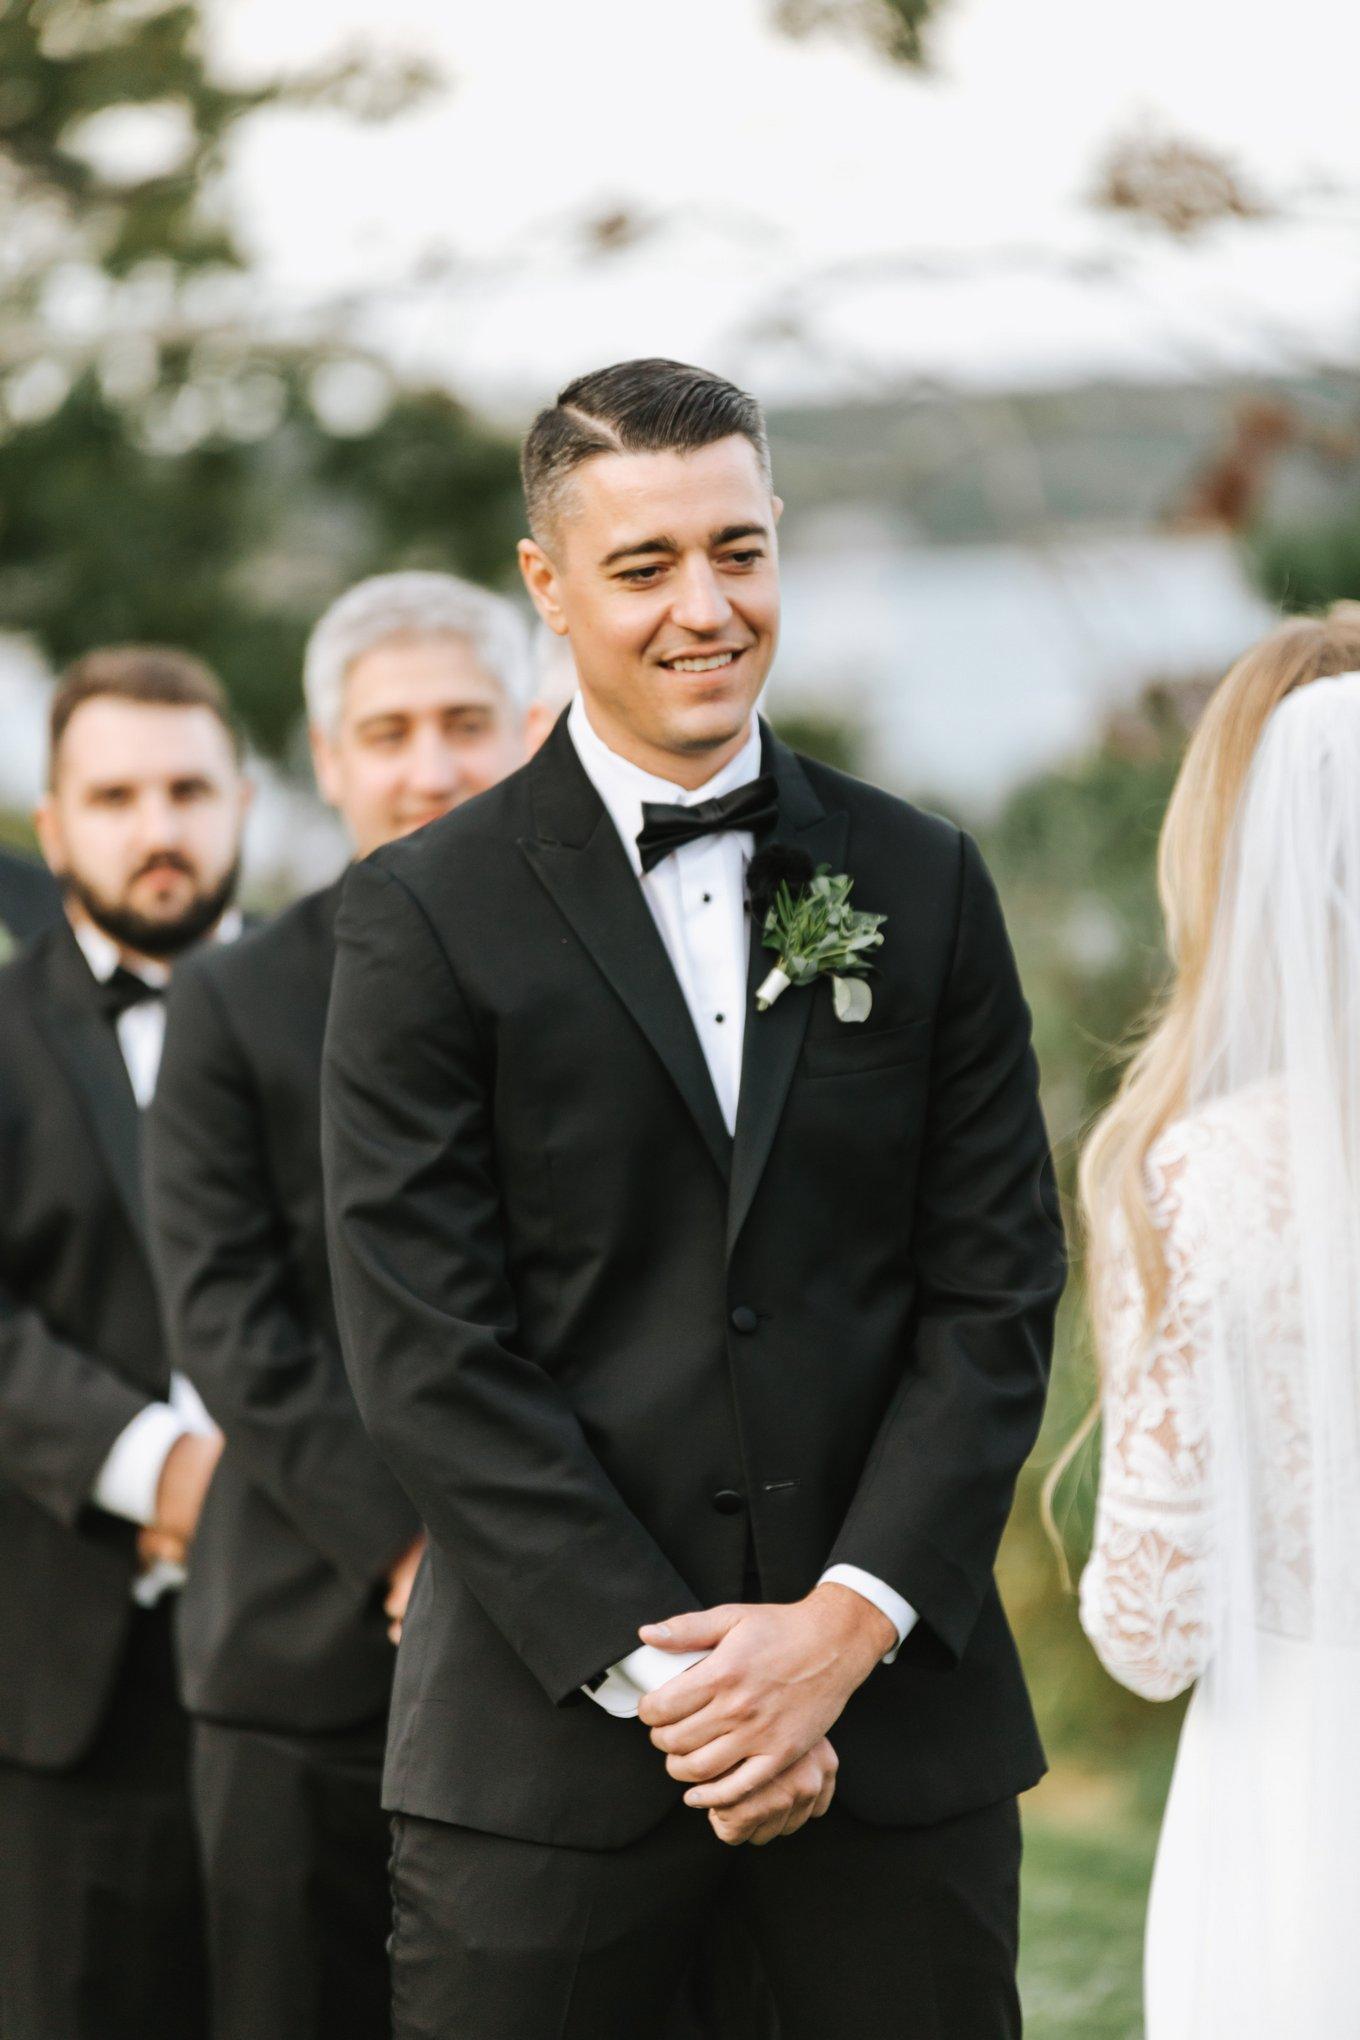 Wequassett-Wedding-Photographer-Cape-Cod-Boston-Lena-Mirisola-31.jpg